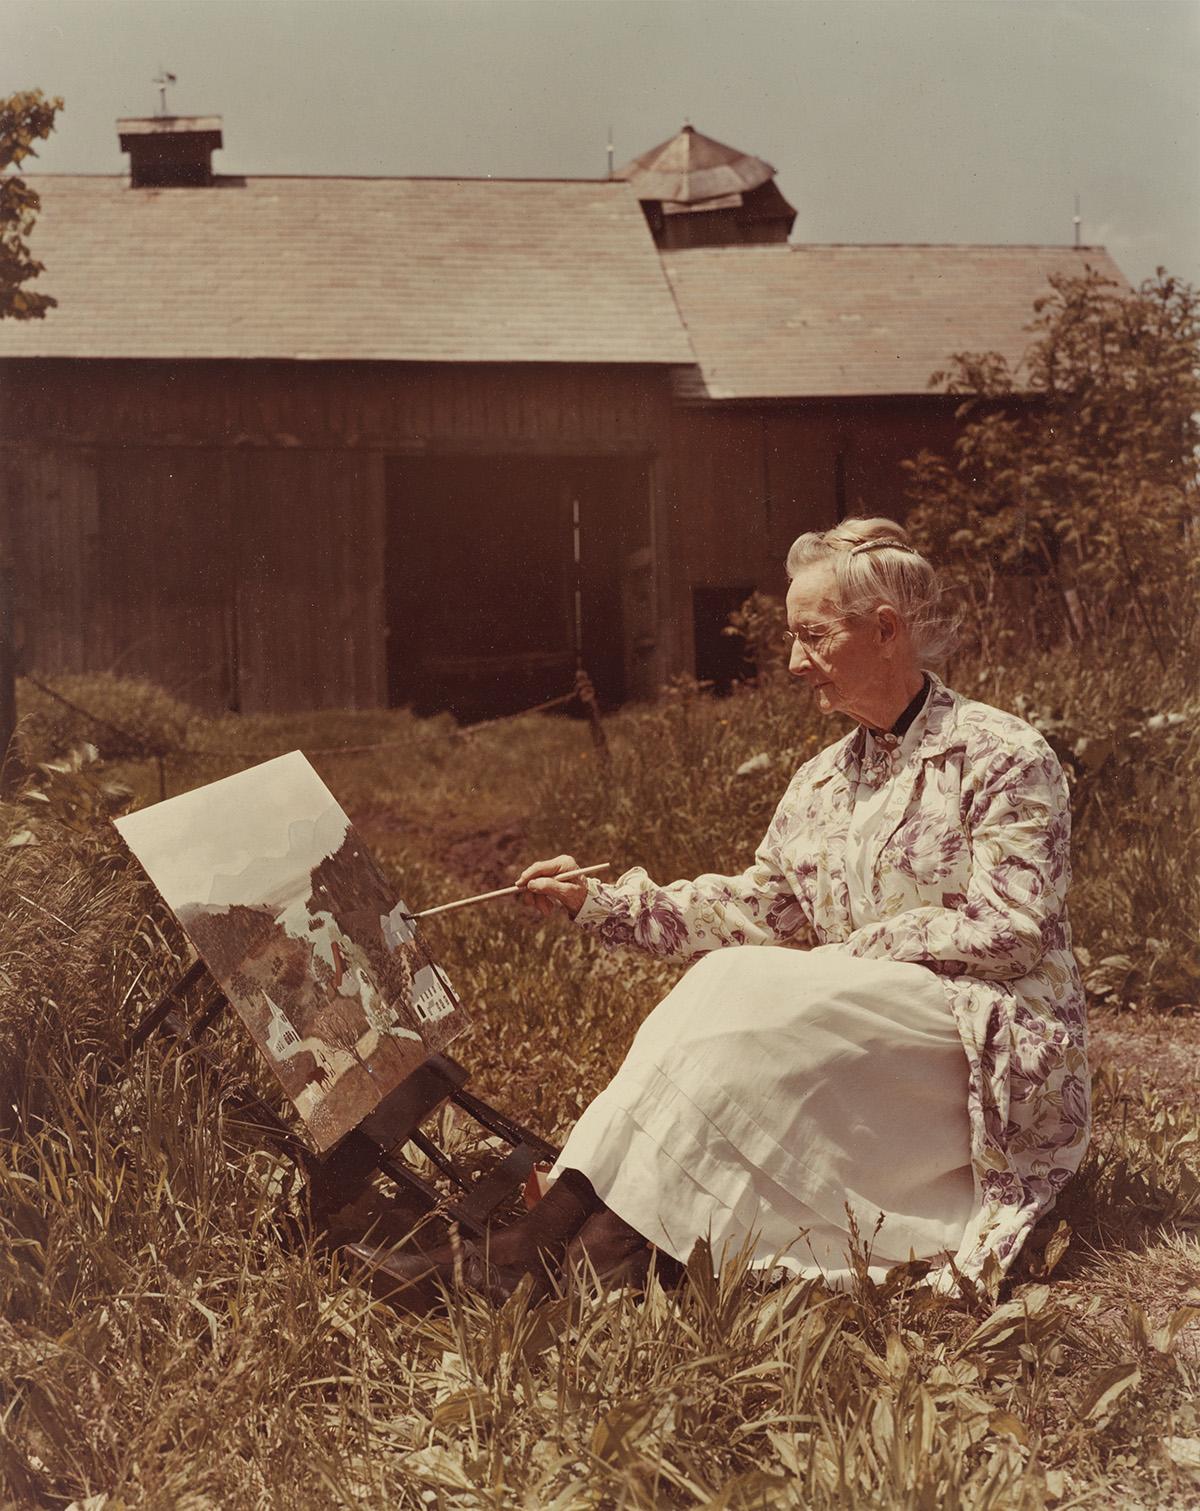 HARRY WARNECKE (1900-1984) Grandma Moses painting a scene.